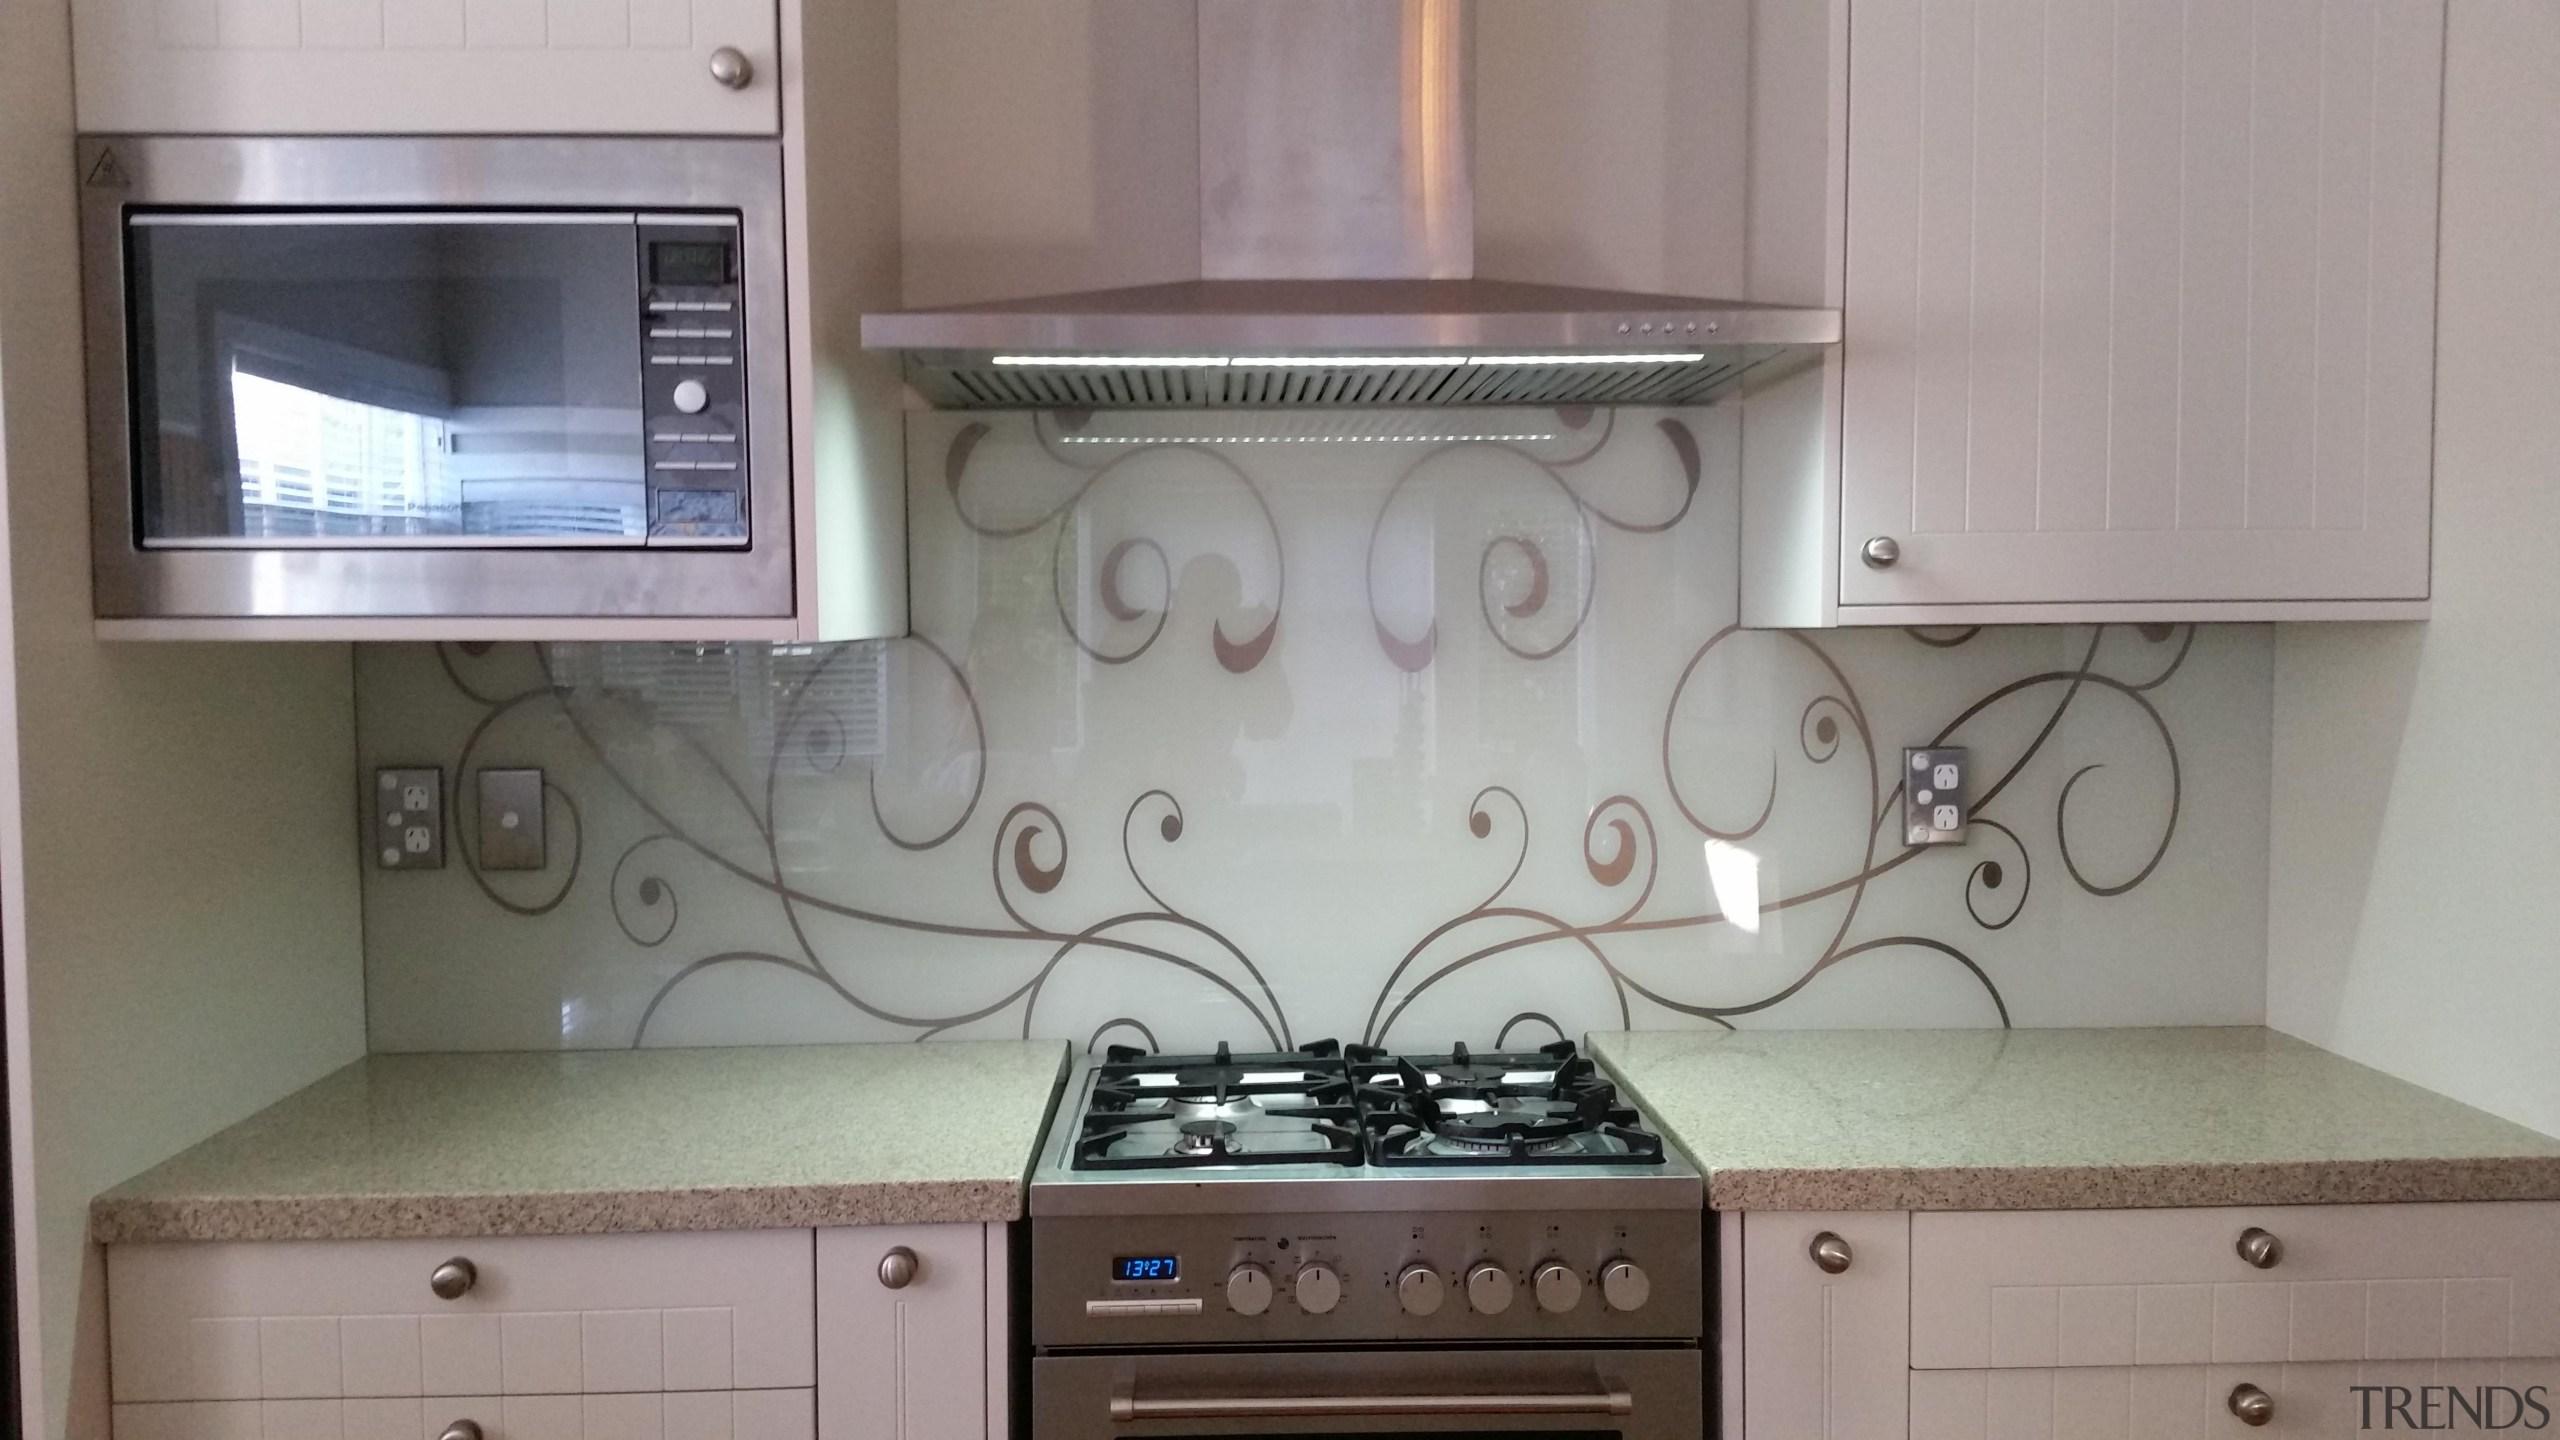 20141014080637.jpg - 20141014080637.jpg - cabinetry | countertop | cabinetry, countertop, floor, flooring, home, home appliance, kitchen, kitchen appliance, kitchen stove, major appliance, room, tile, gray